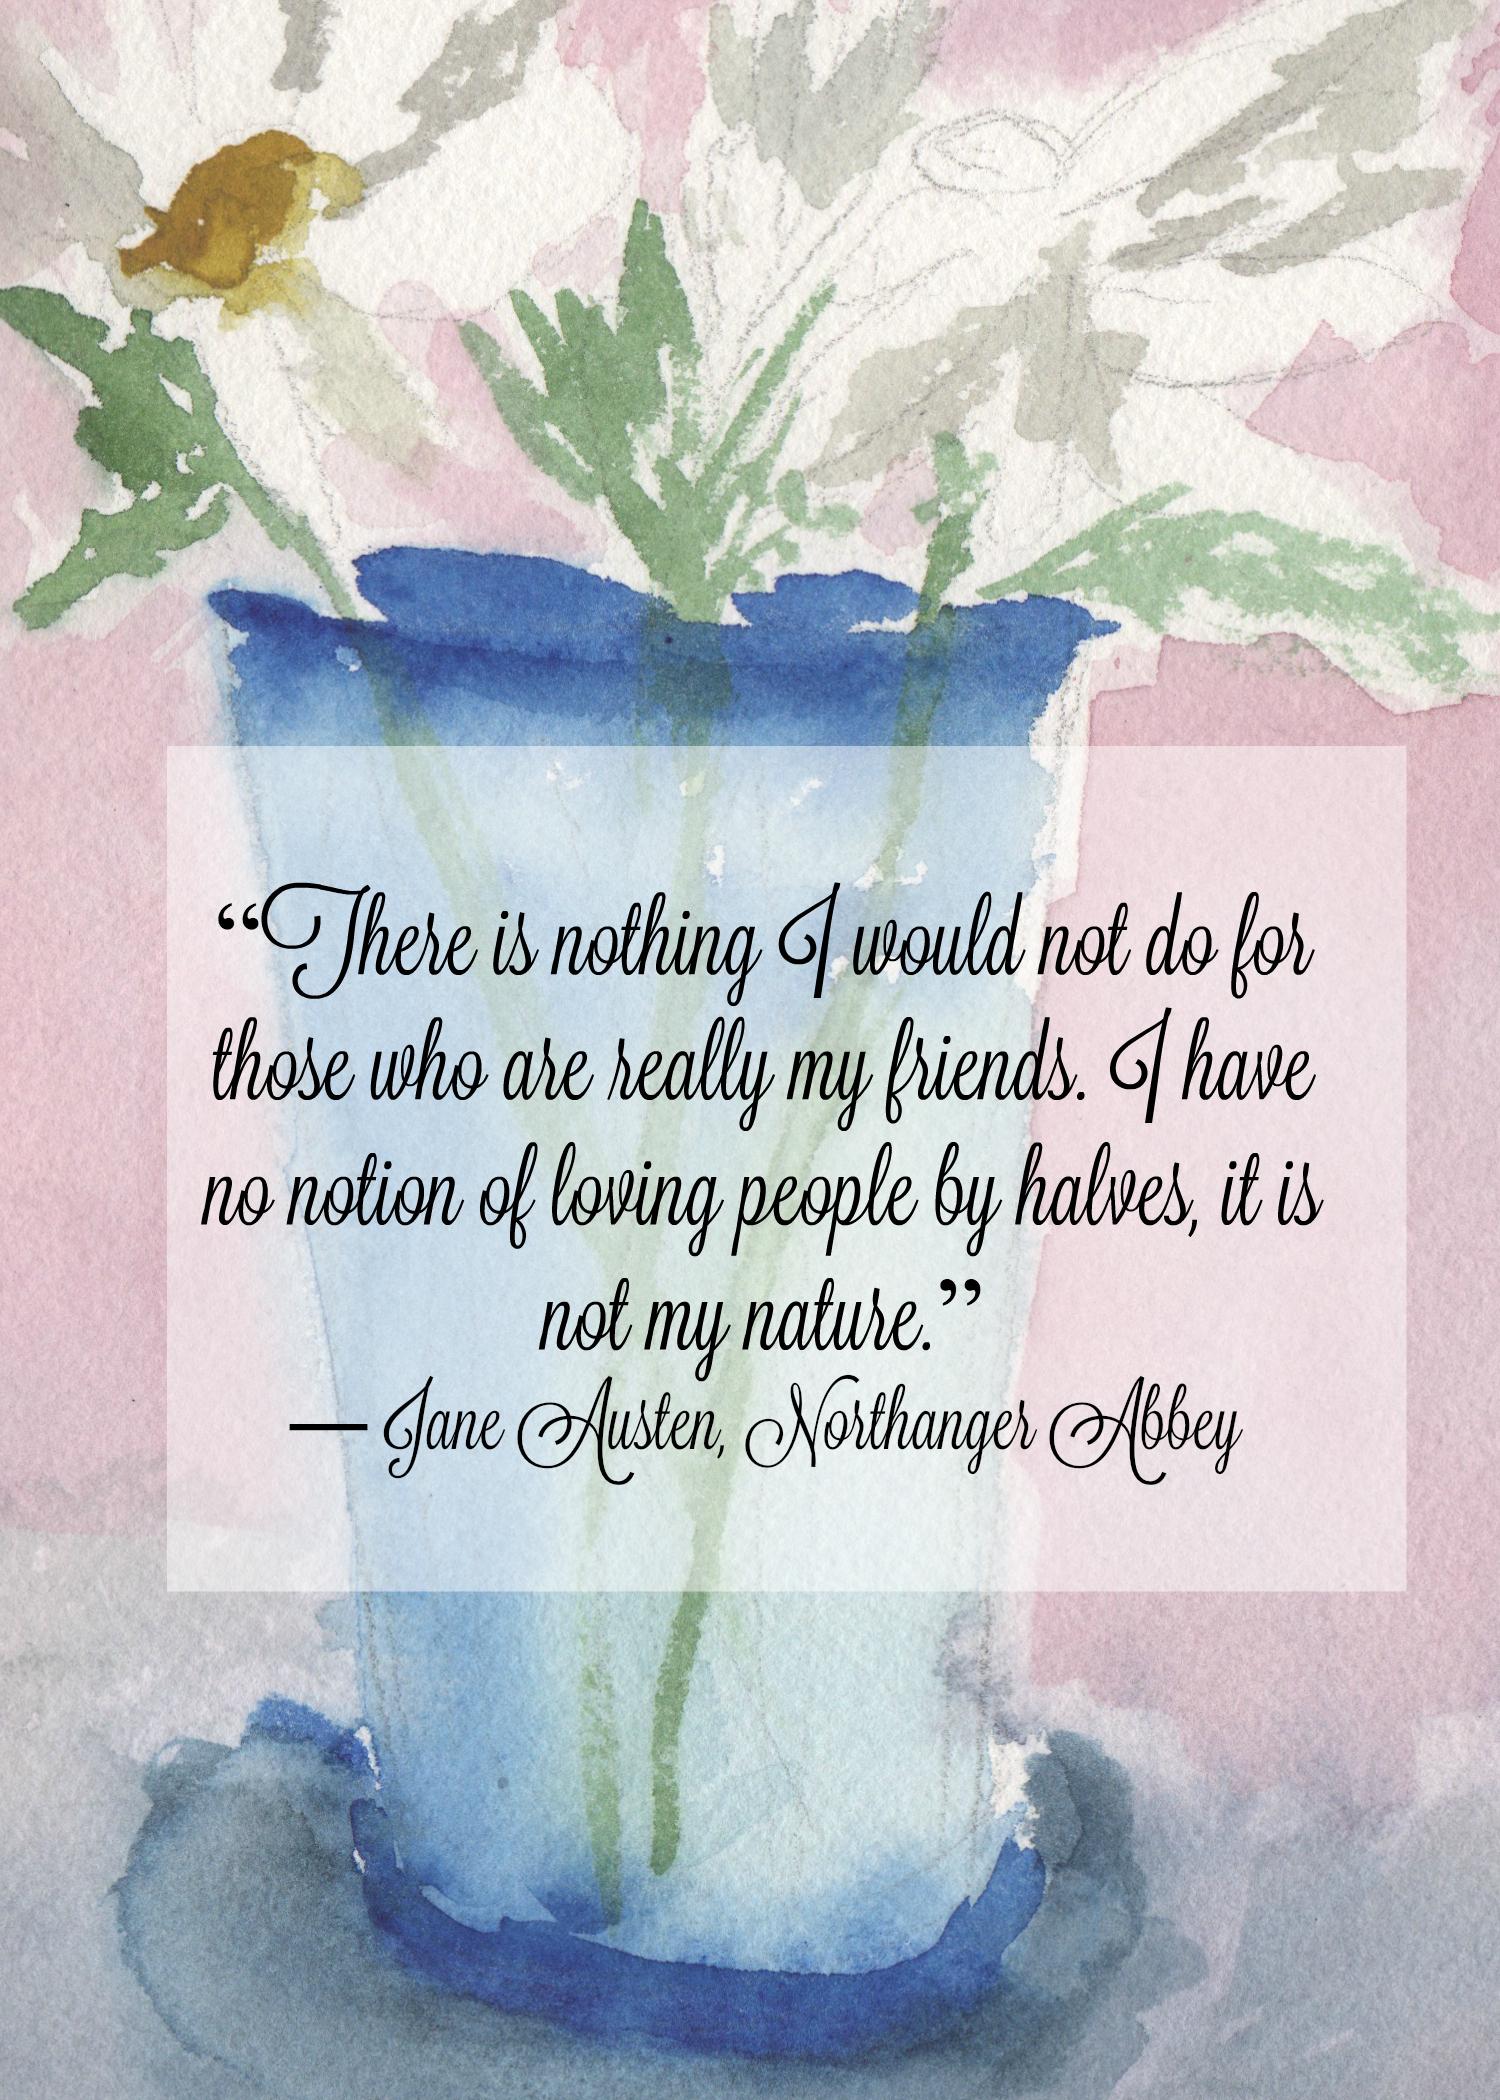 Jane Austen Friendship Quote Daisy Watercolor - Finding ...